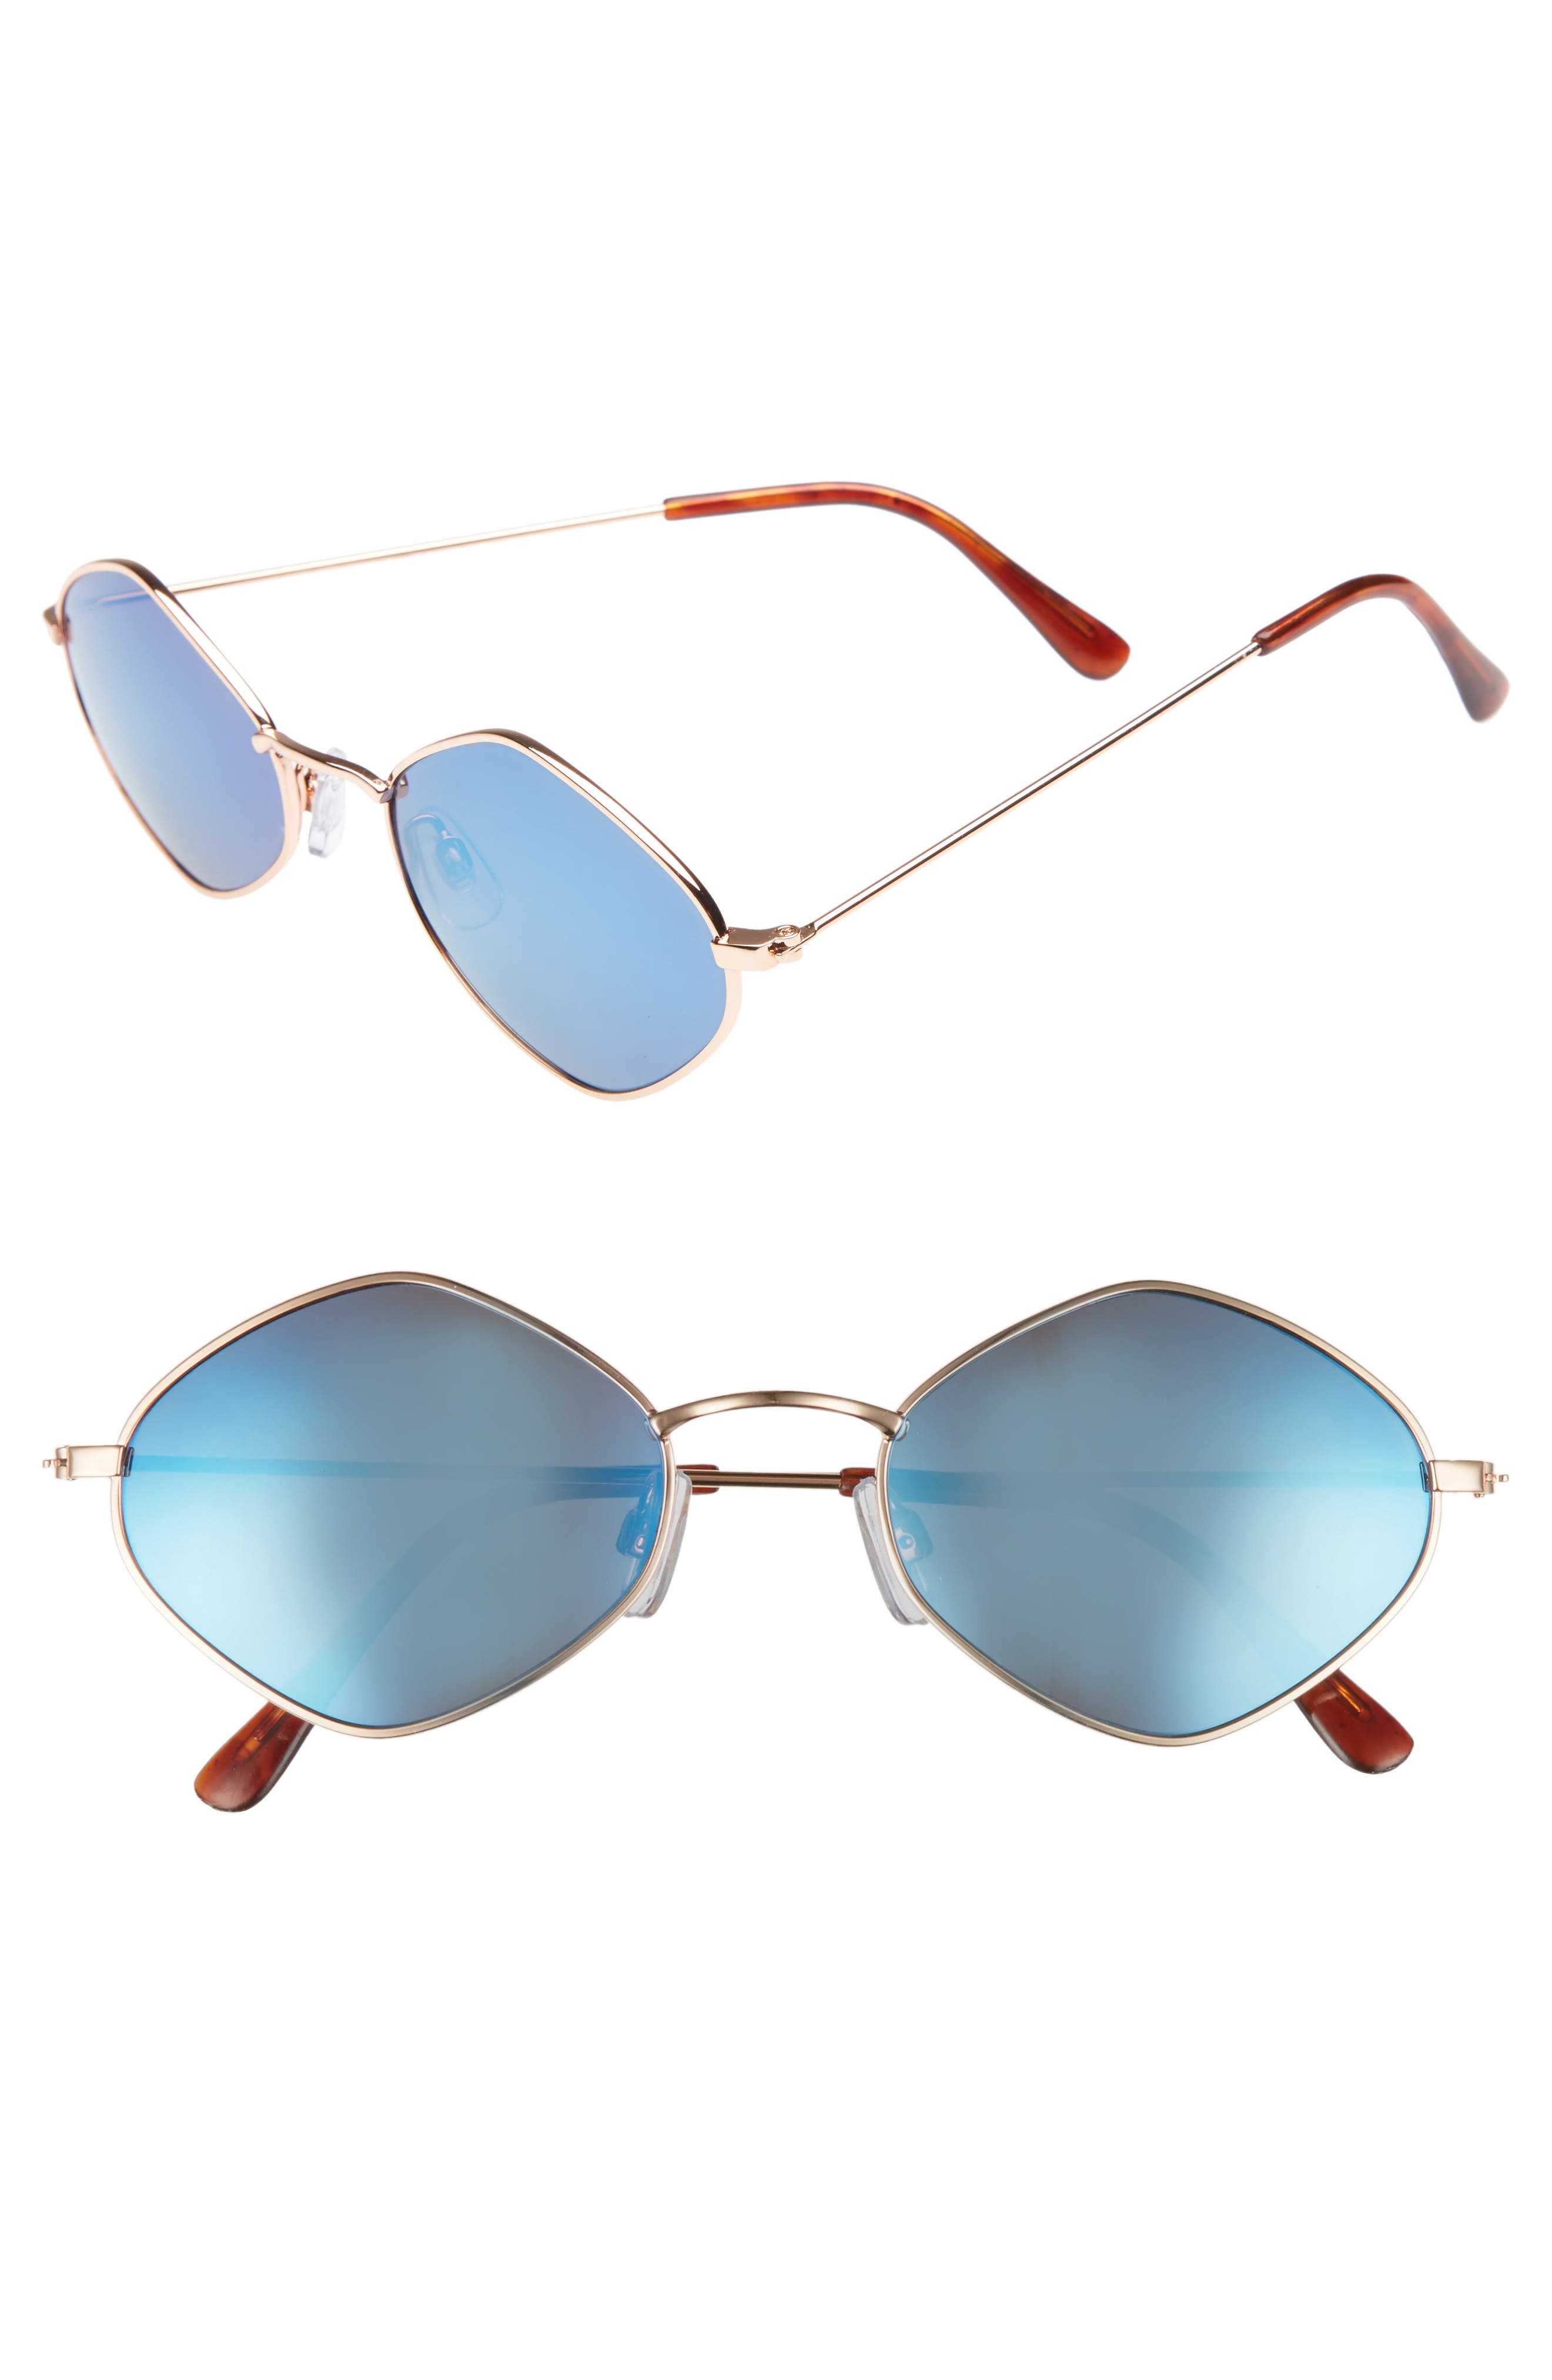 57mm Geo Sunglasses,                             Main thumbnail 1, color,                             Gold/ Blue